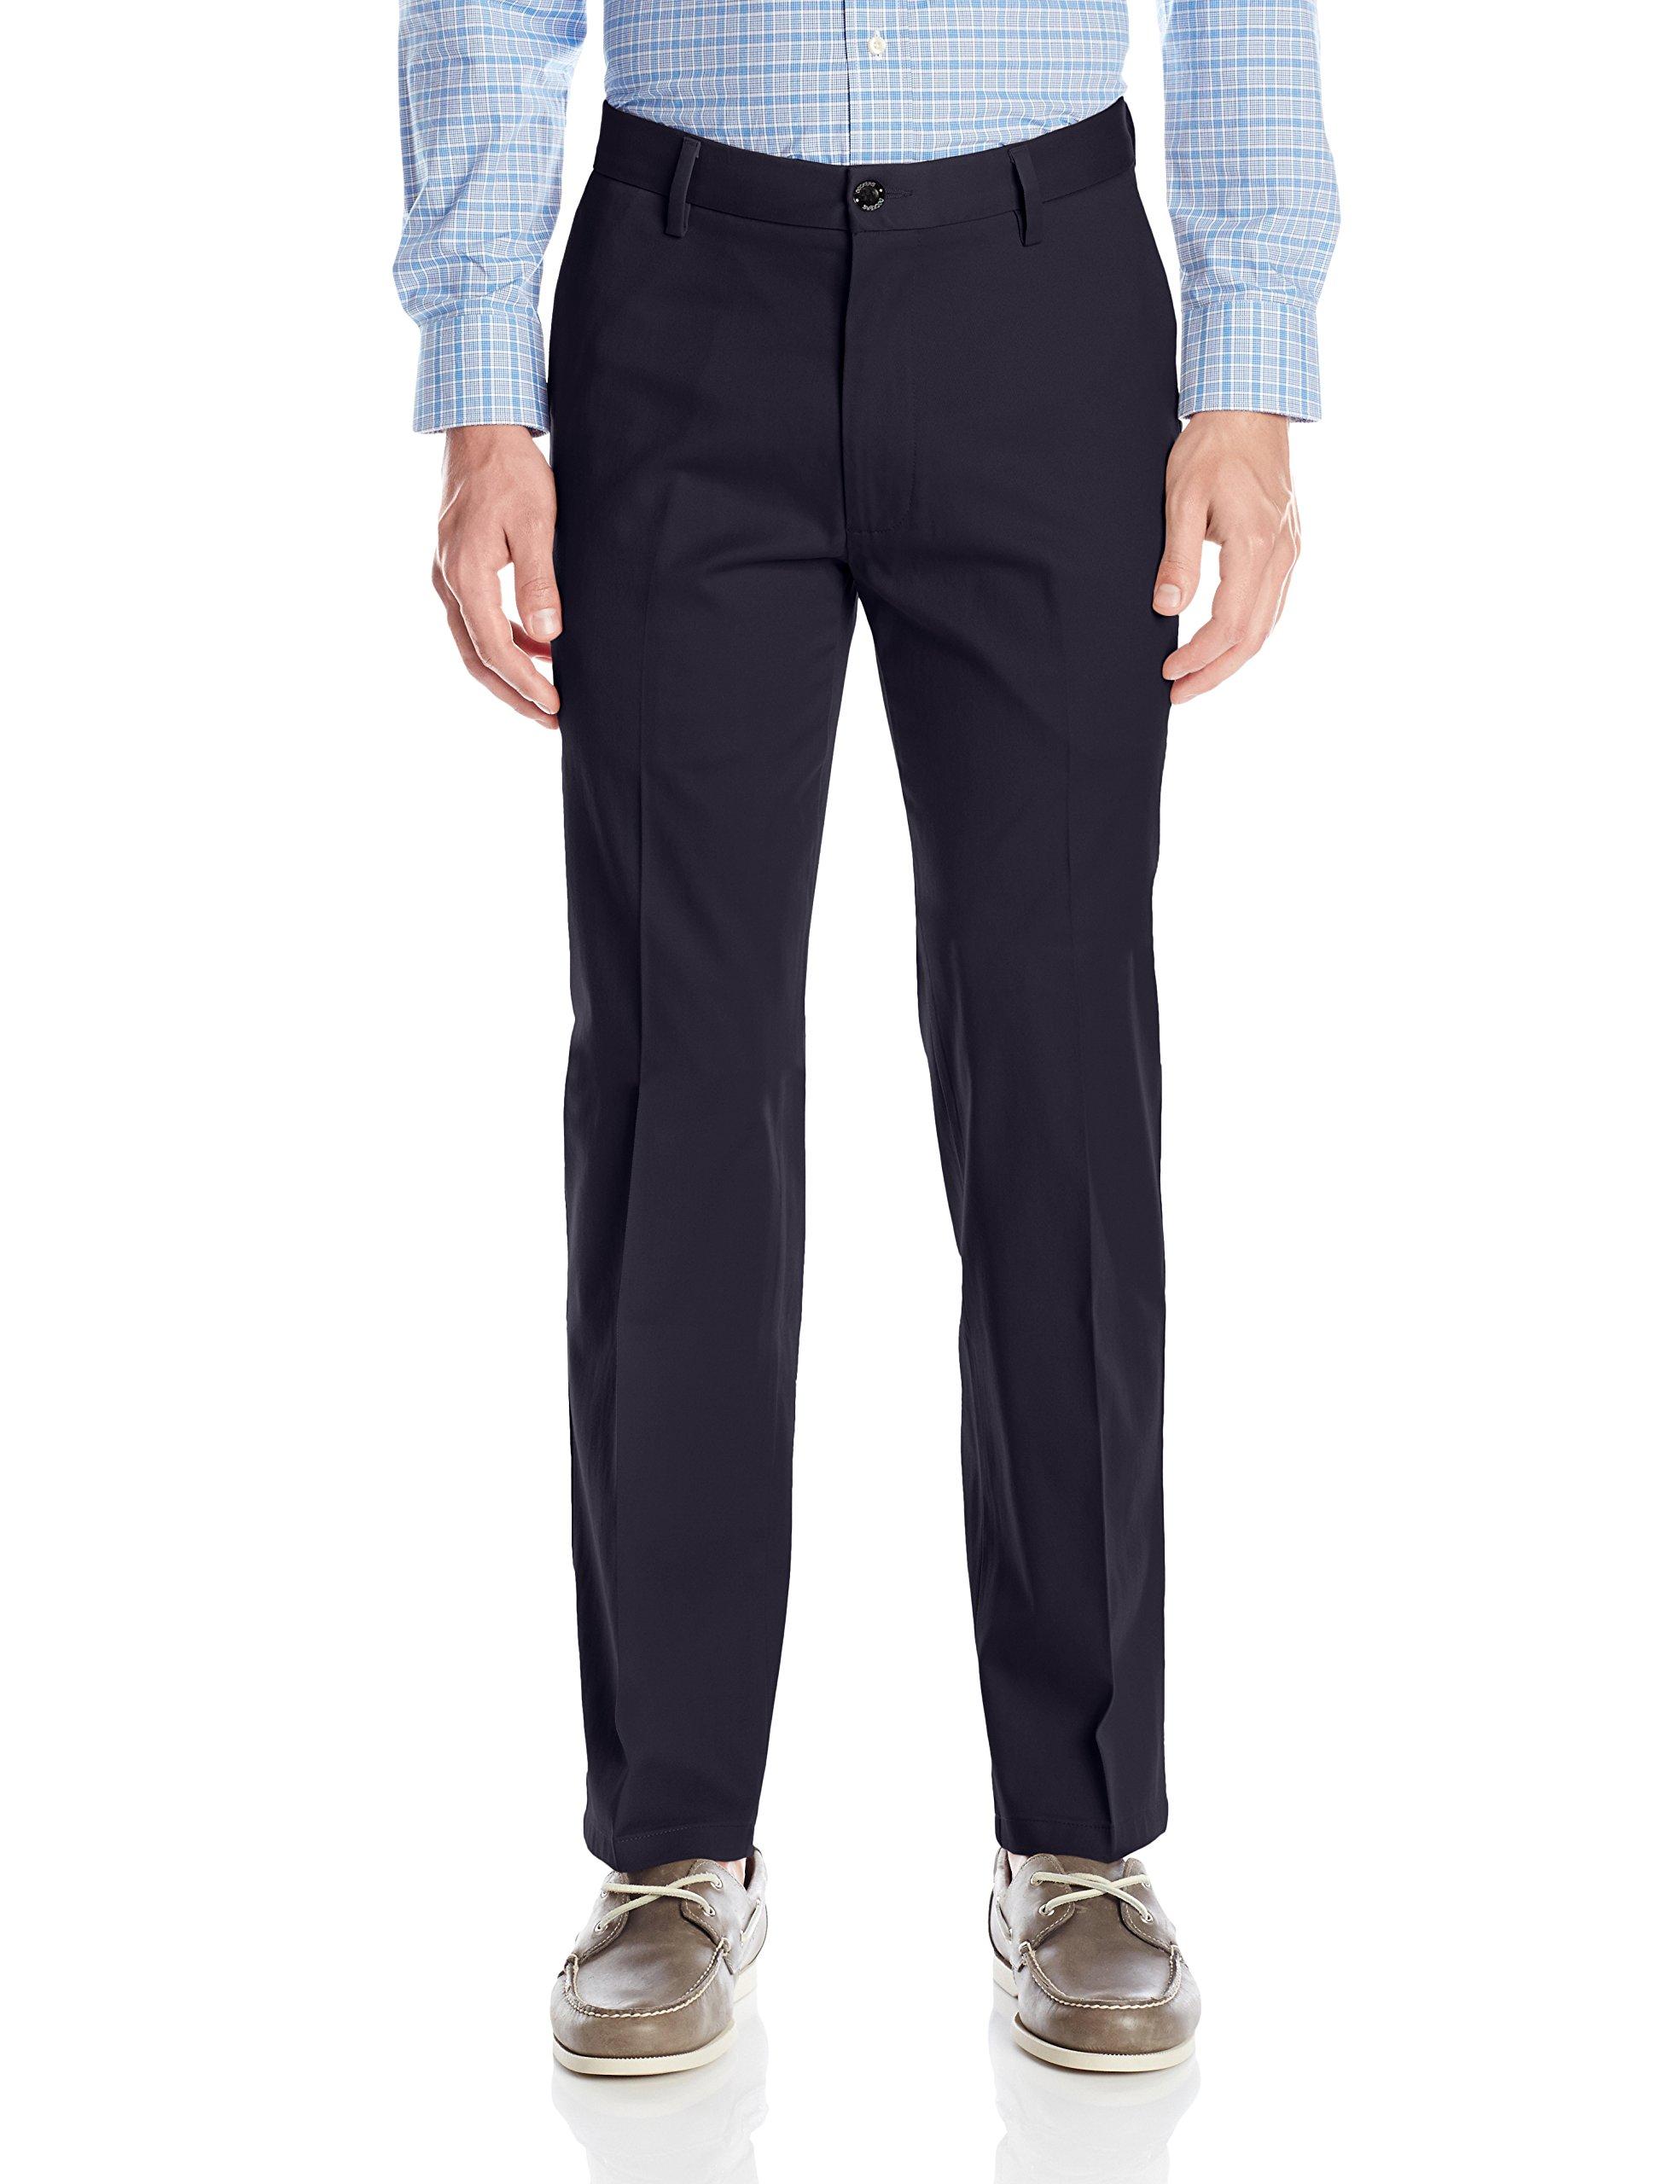 Dockers Men's Straight Fit Signature Khaki Pant D2, Navy (Stretch), 36W x 30L by Dockers